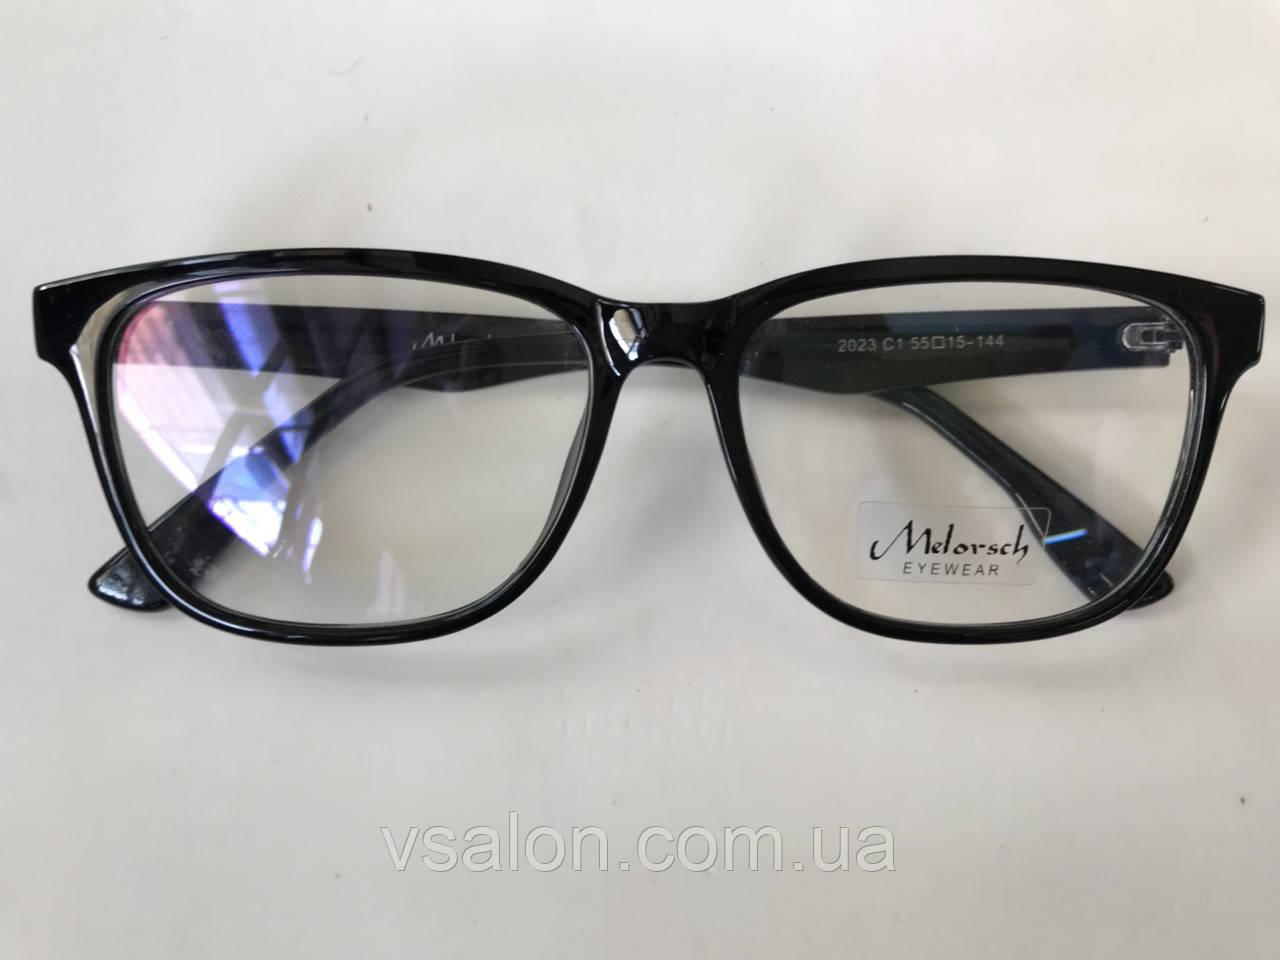 Іміджеві окуляри Melorsch 2023